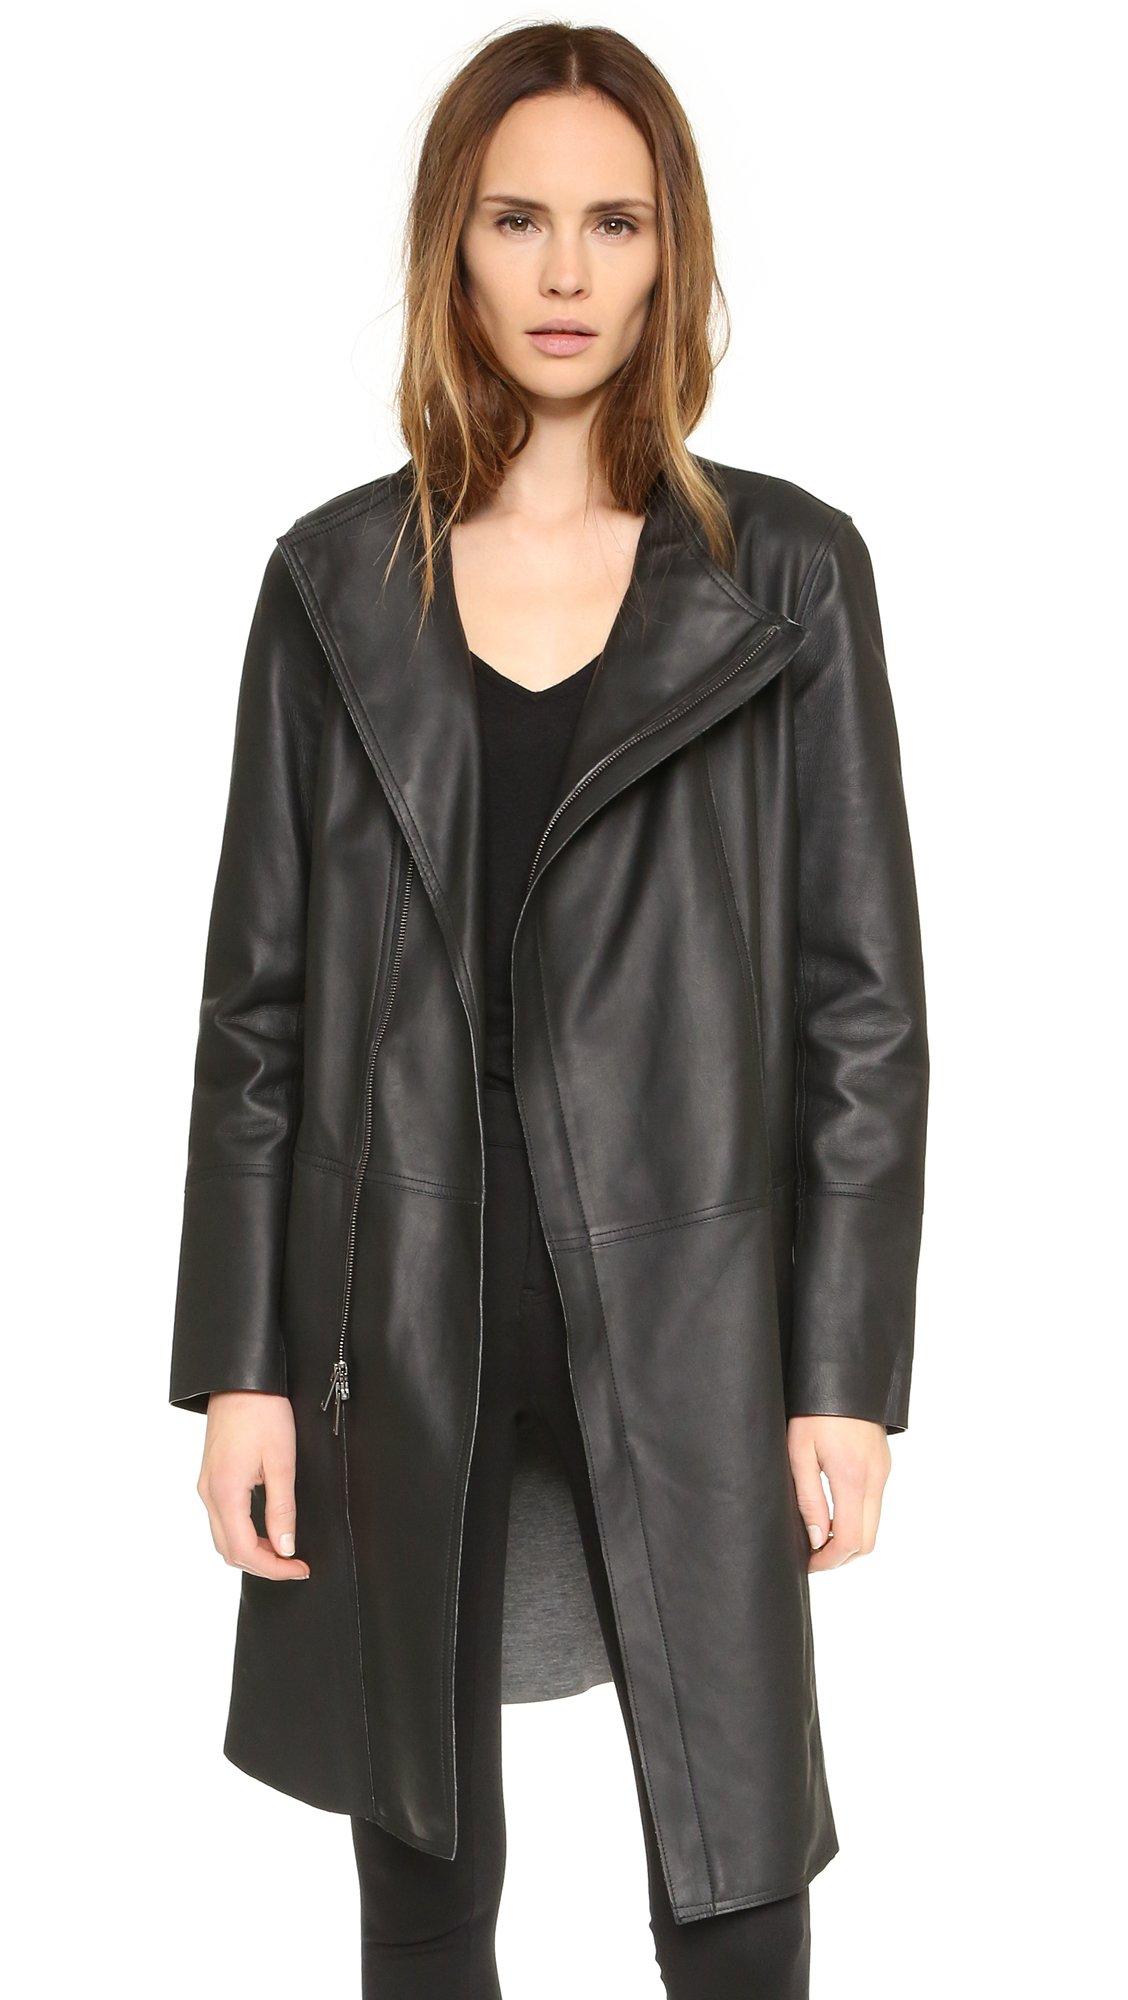 Dkny leather jackets